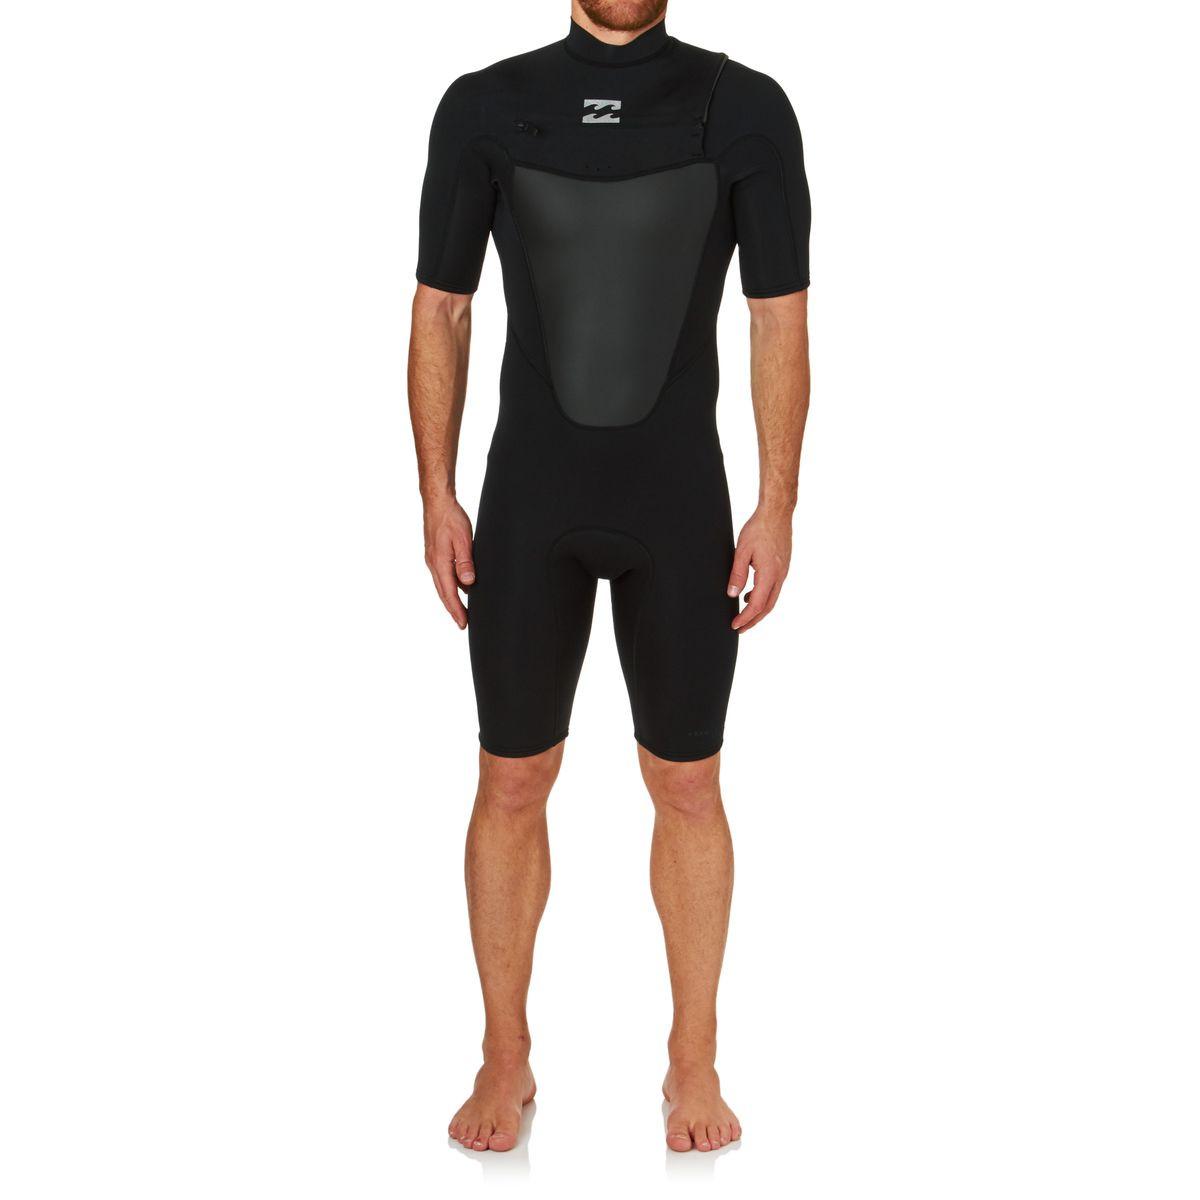 Billabong Absolute Comp 2mm 2017 Chest Zip Short Sleeve Shorty Wetsuit - Black